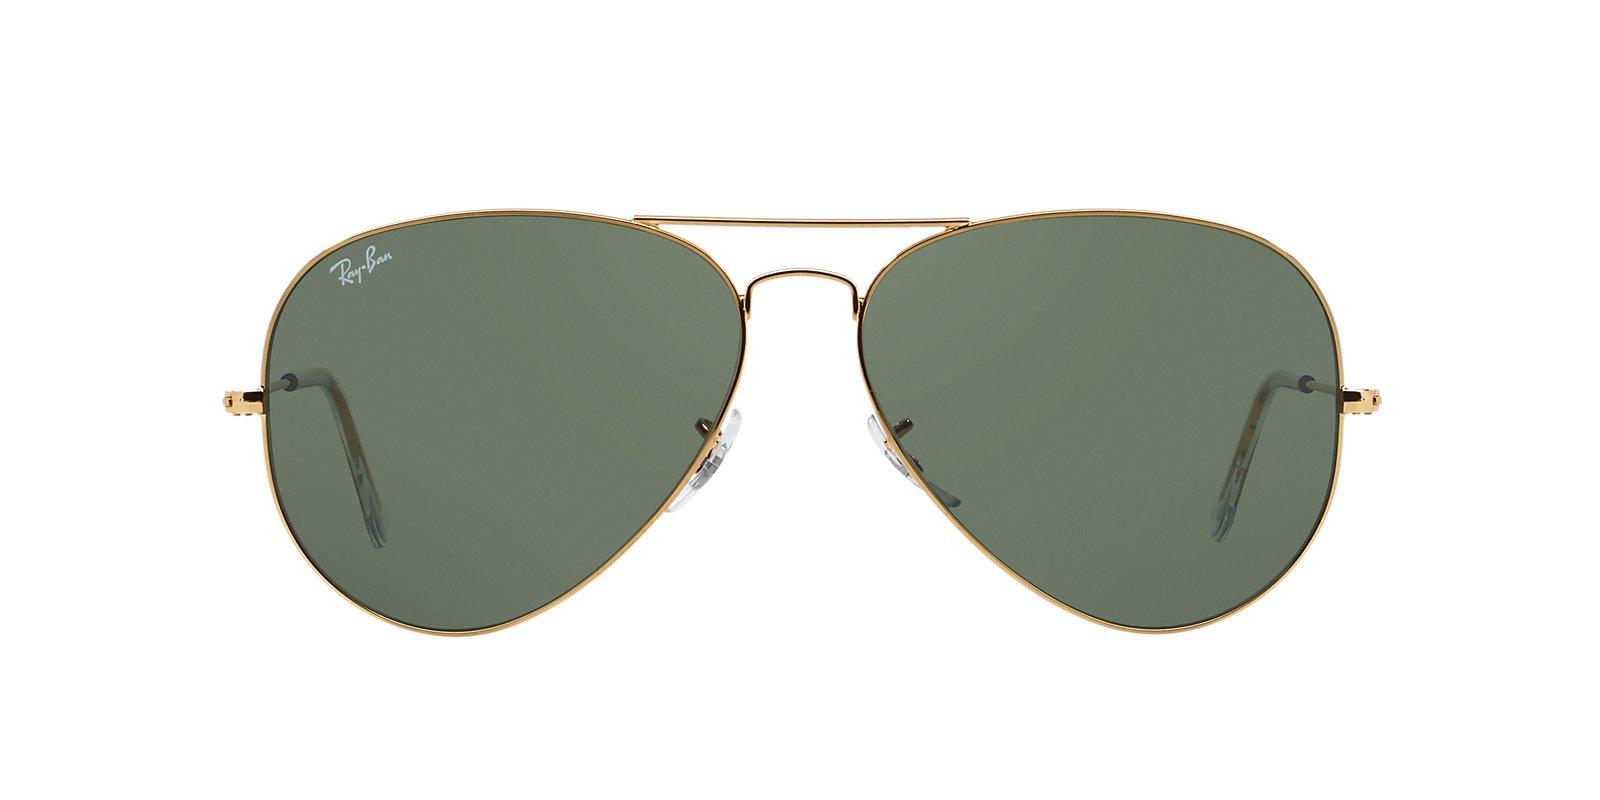 Ban rb3026 62 aviator ii large sunglasses from sunglass hut http://www.sunglasshut.com/us/805289628460